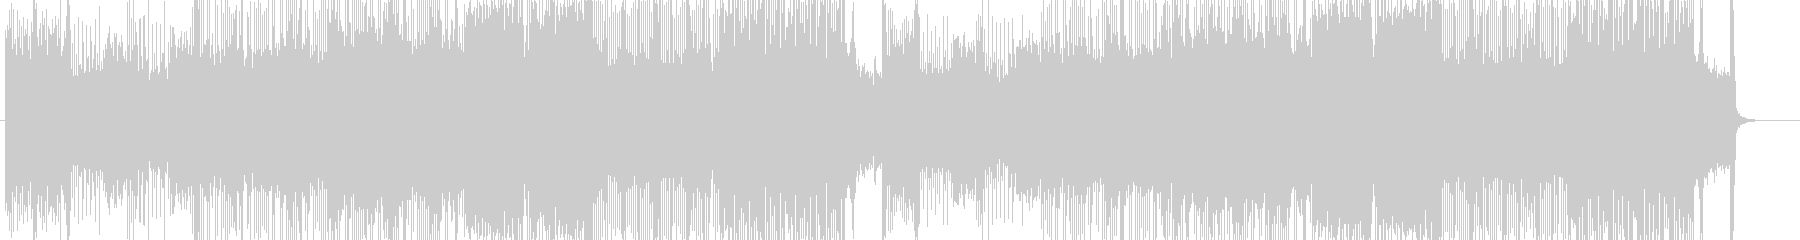 「HR/HM」「DARK」BGM88の未再生の波形